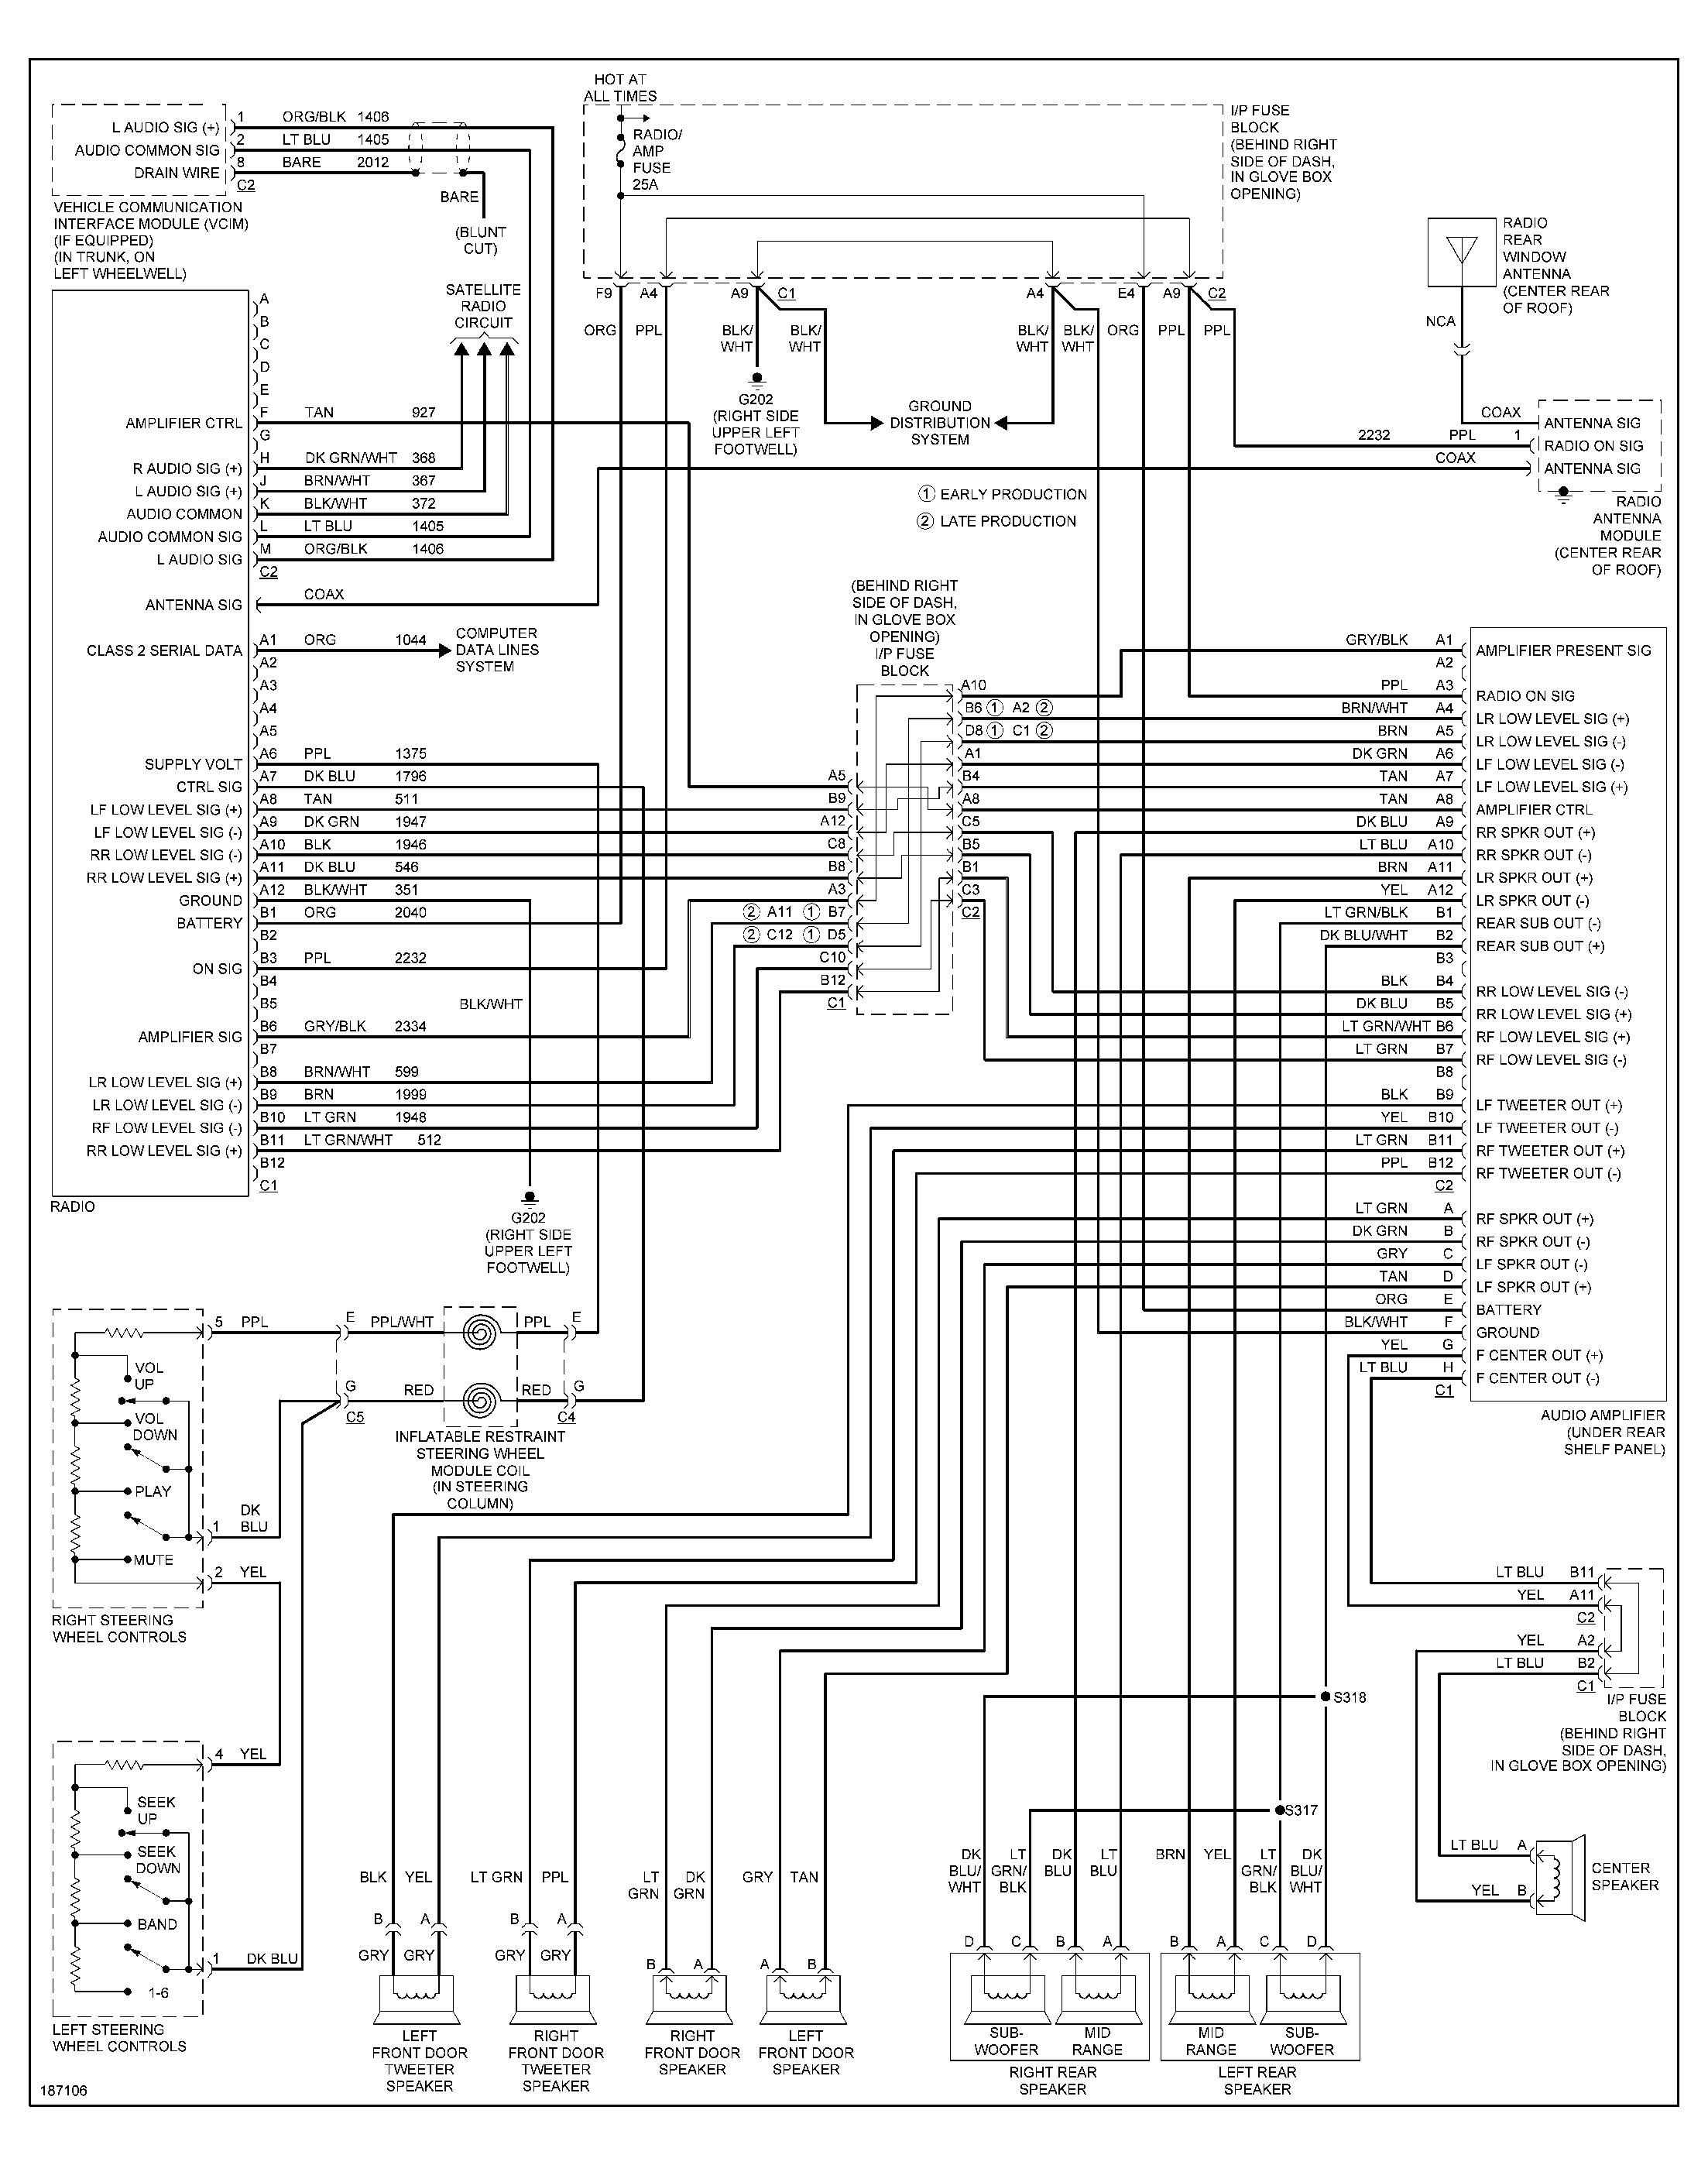 2001 pontiac grand prix abs wiring diagram 2004 for 2007 g6 on 2007 pontiac g6 wiring diagram within 2007 pontiac g6 wiring diagram